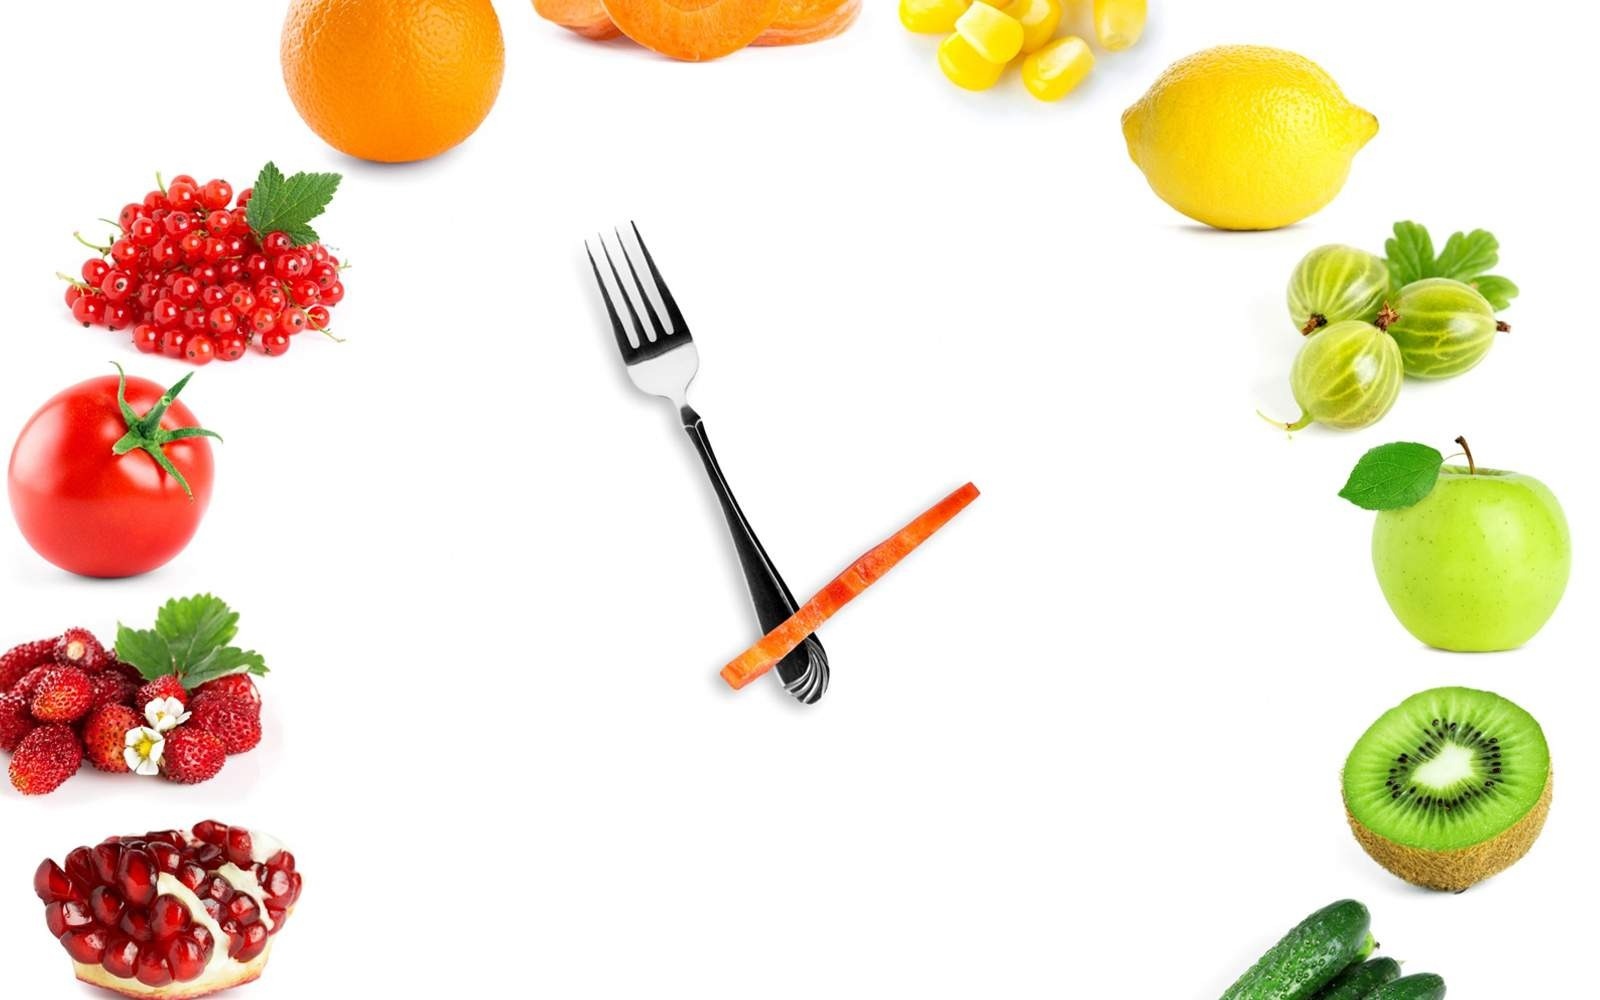 Simak 4 Cara Mengatur Jadwal Makan Saat Berpuasa bagi Diabetesi!